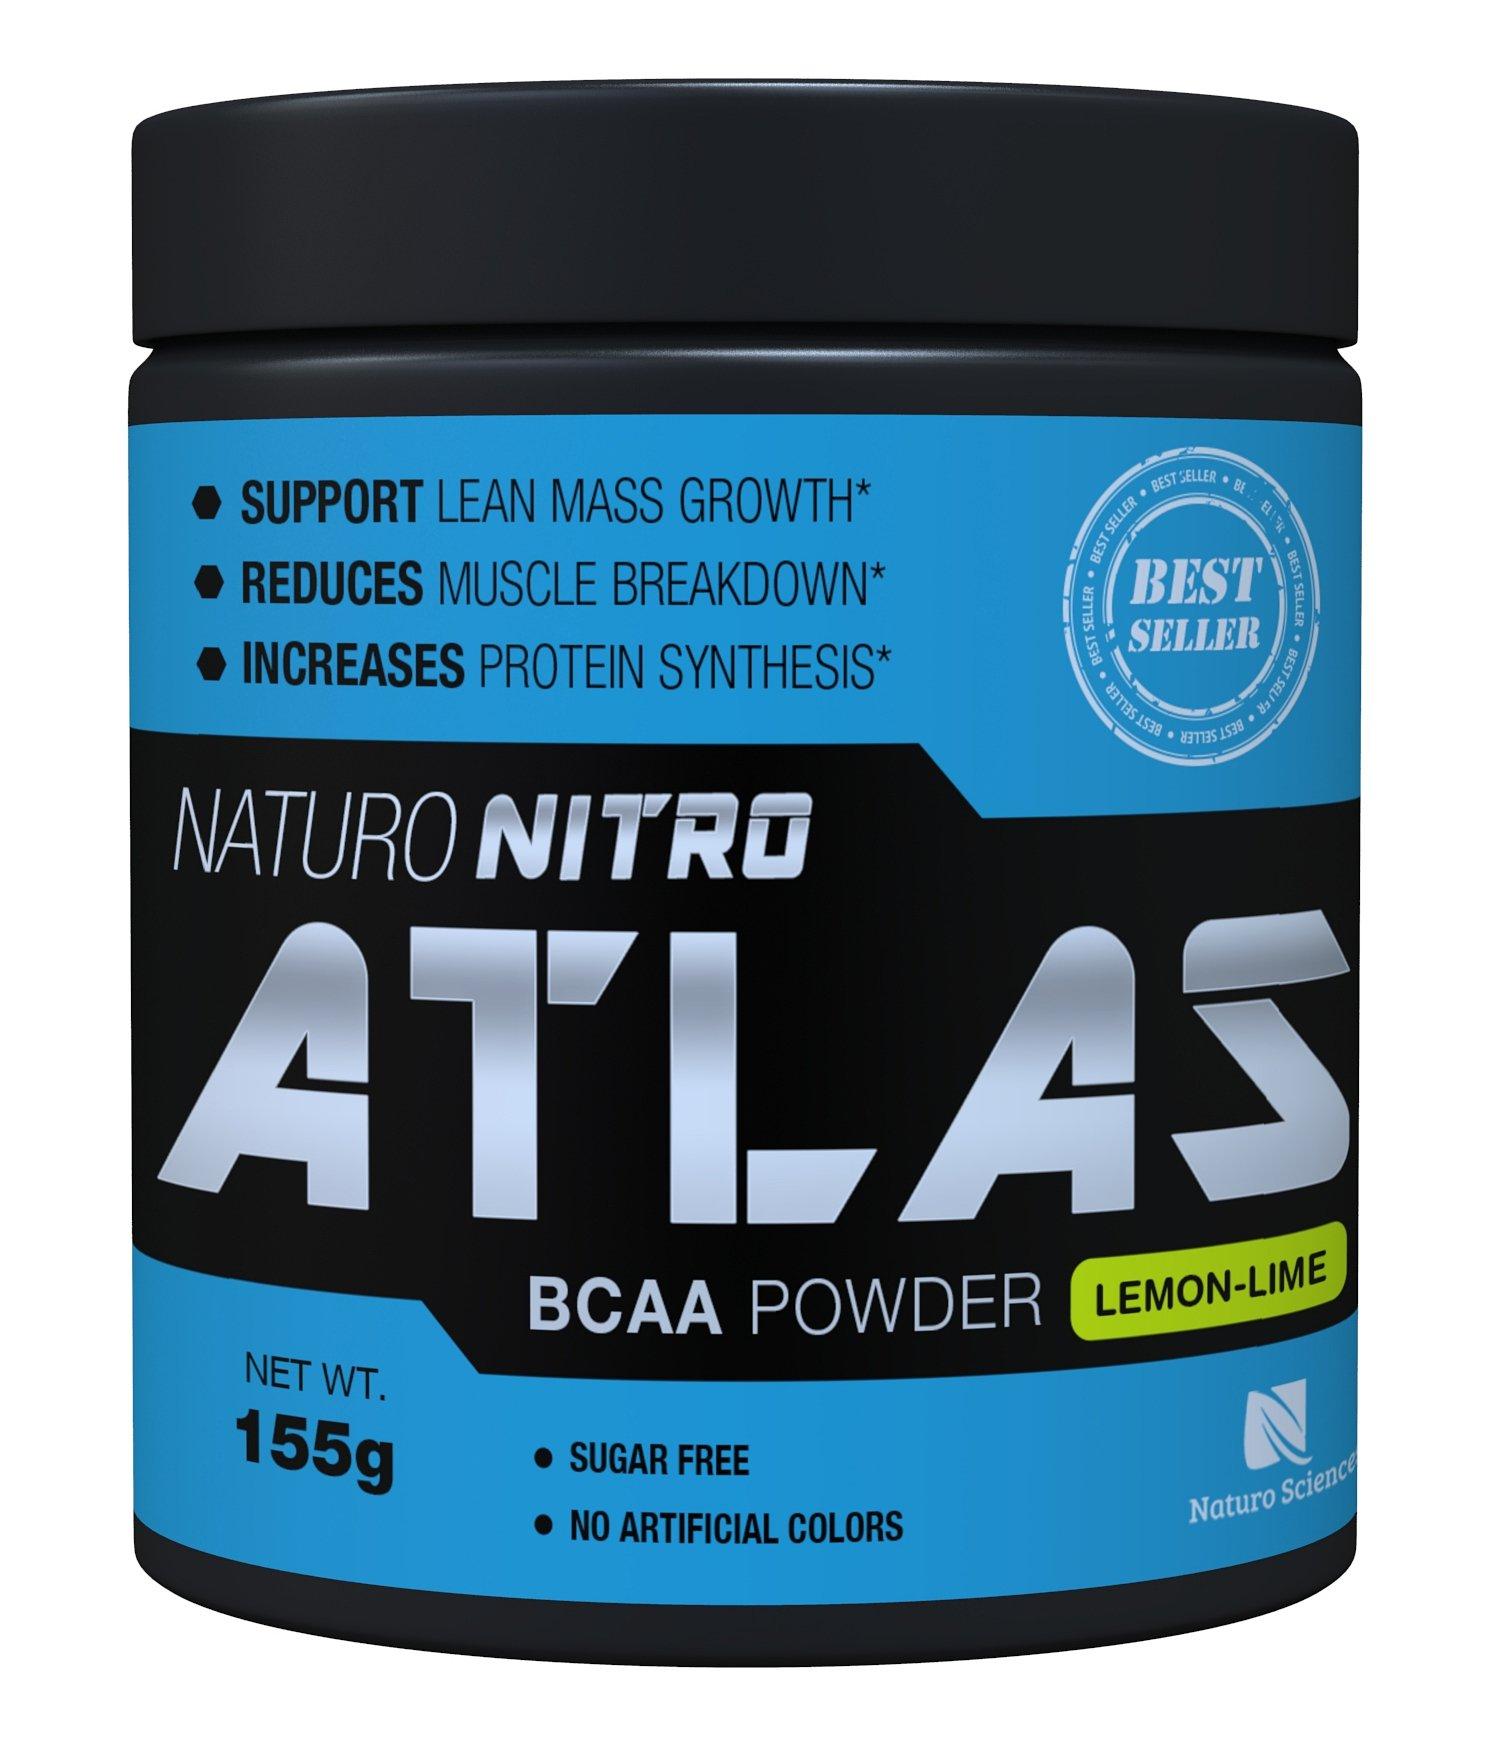 Naturo Nitro Atlas, BCAA Instantized Powder, Best Branched Chain Amino Acids, 28 Servings, 5.5g Per Serving, Lemon Lime Flavor